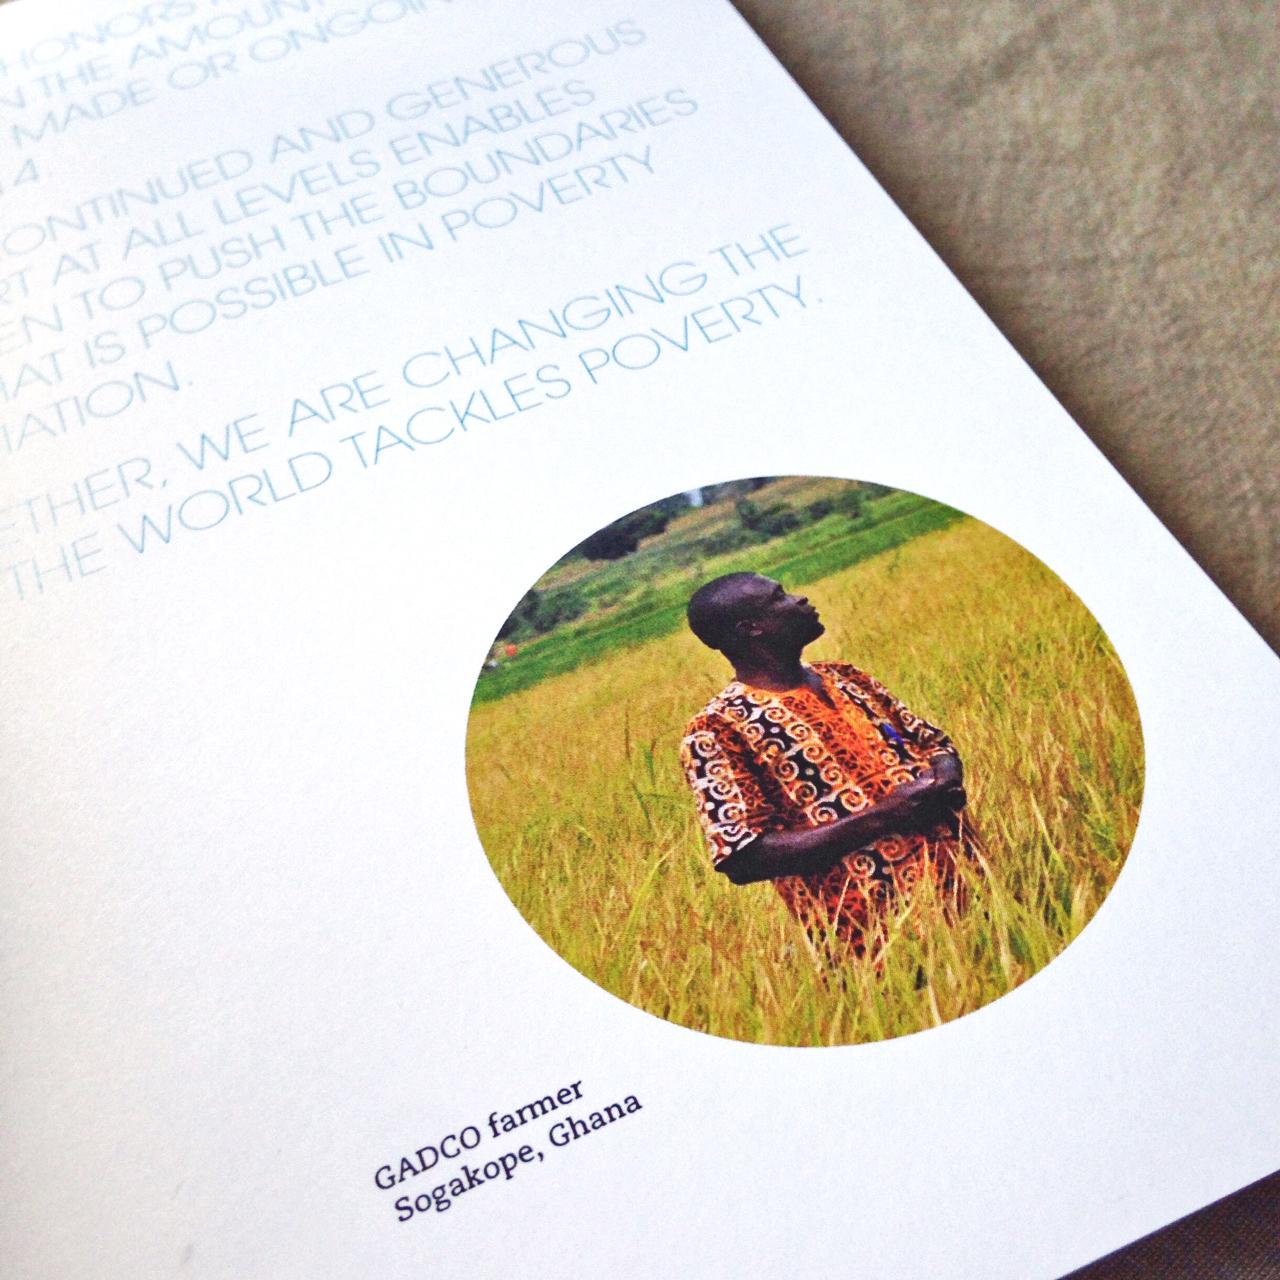 Our Community Booklet | Acumen Partner Gathering 2014